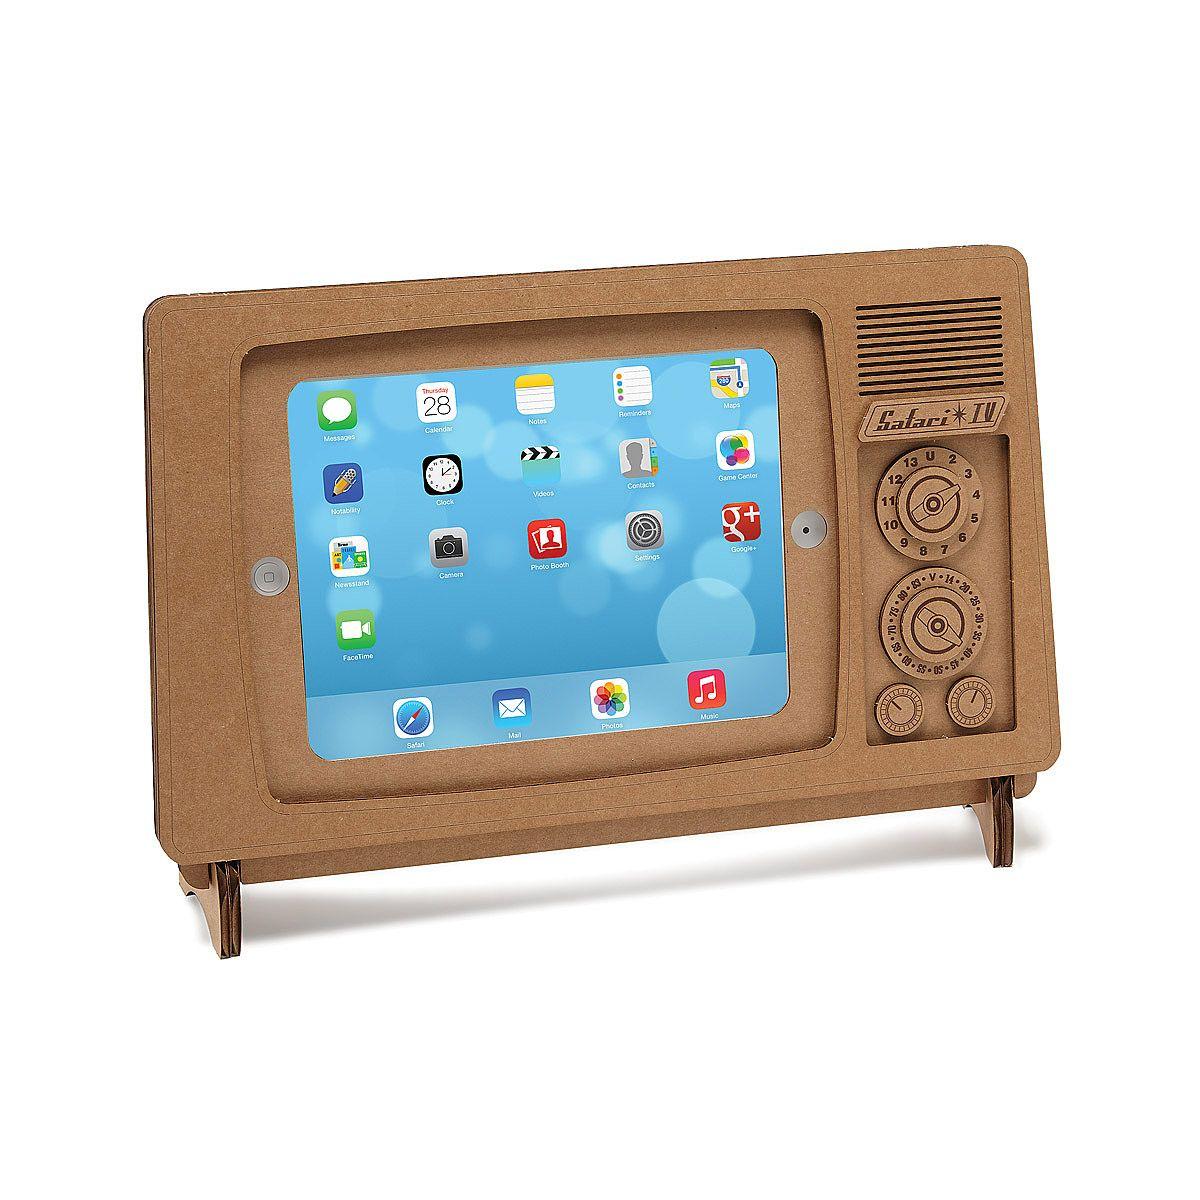 Cardboard iPad TV Stand | iPad, Tv stands and TVs